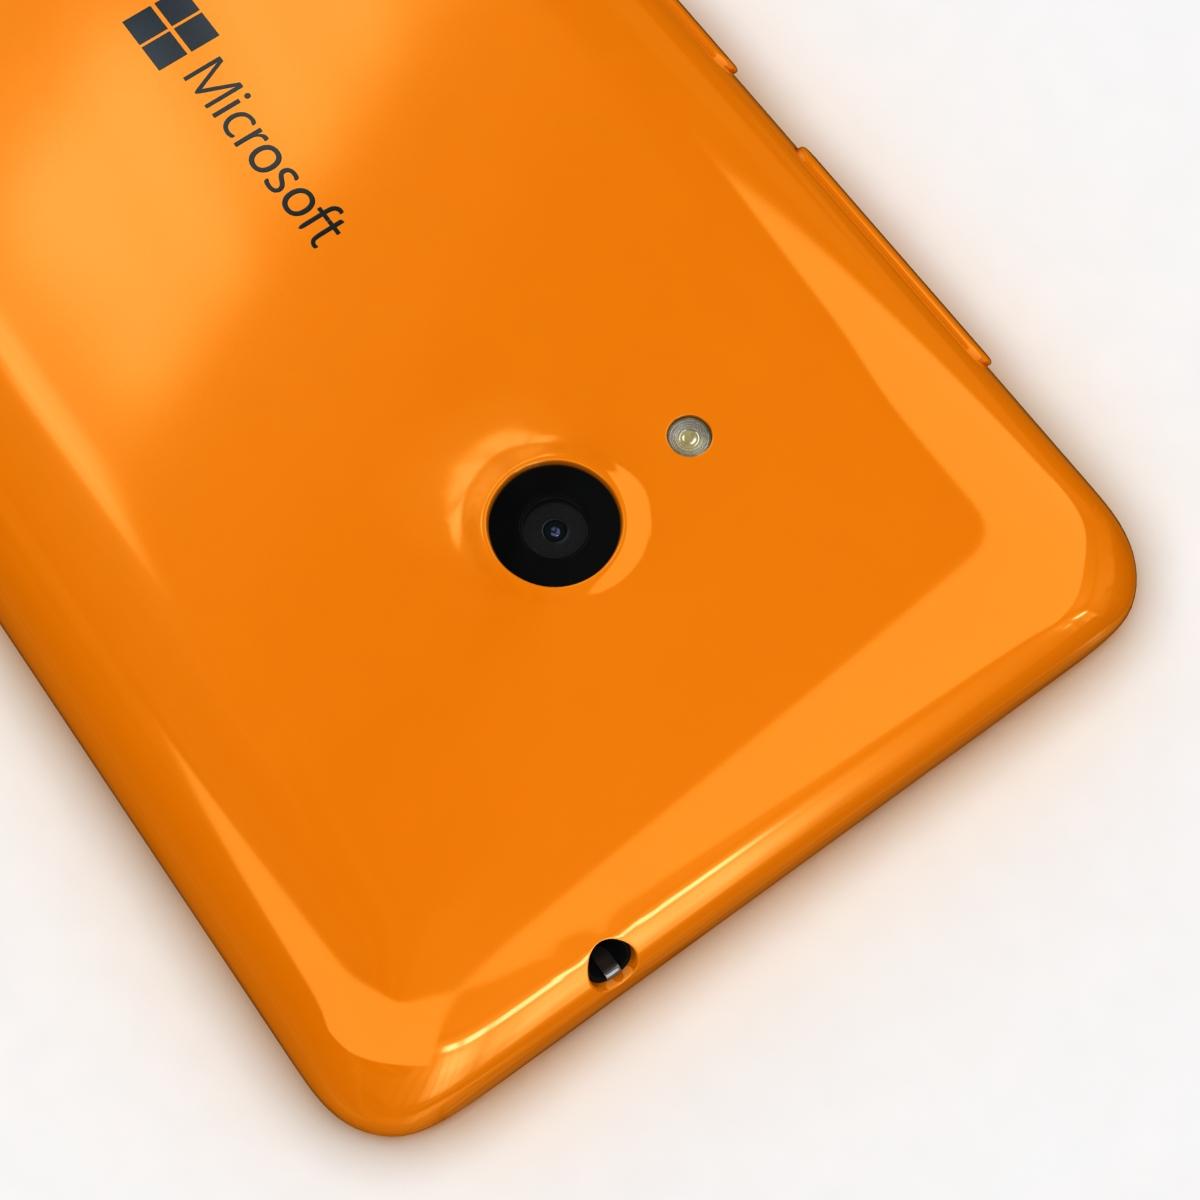 microsoft lumia 535 and dual sim orange 3d model 3ds max fbx c4d obj 204115